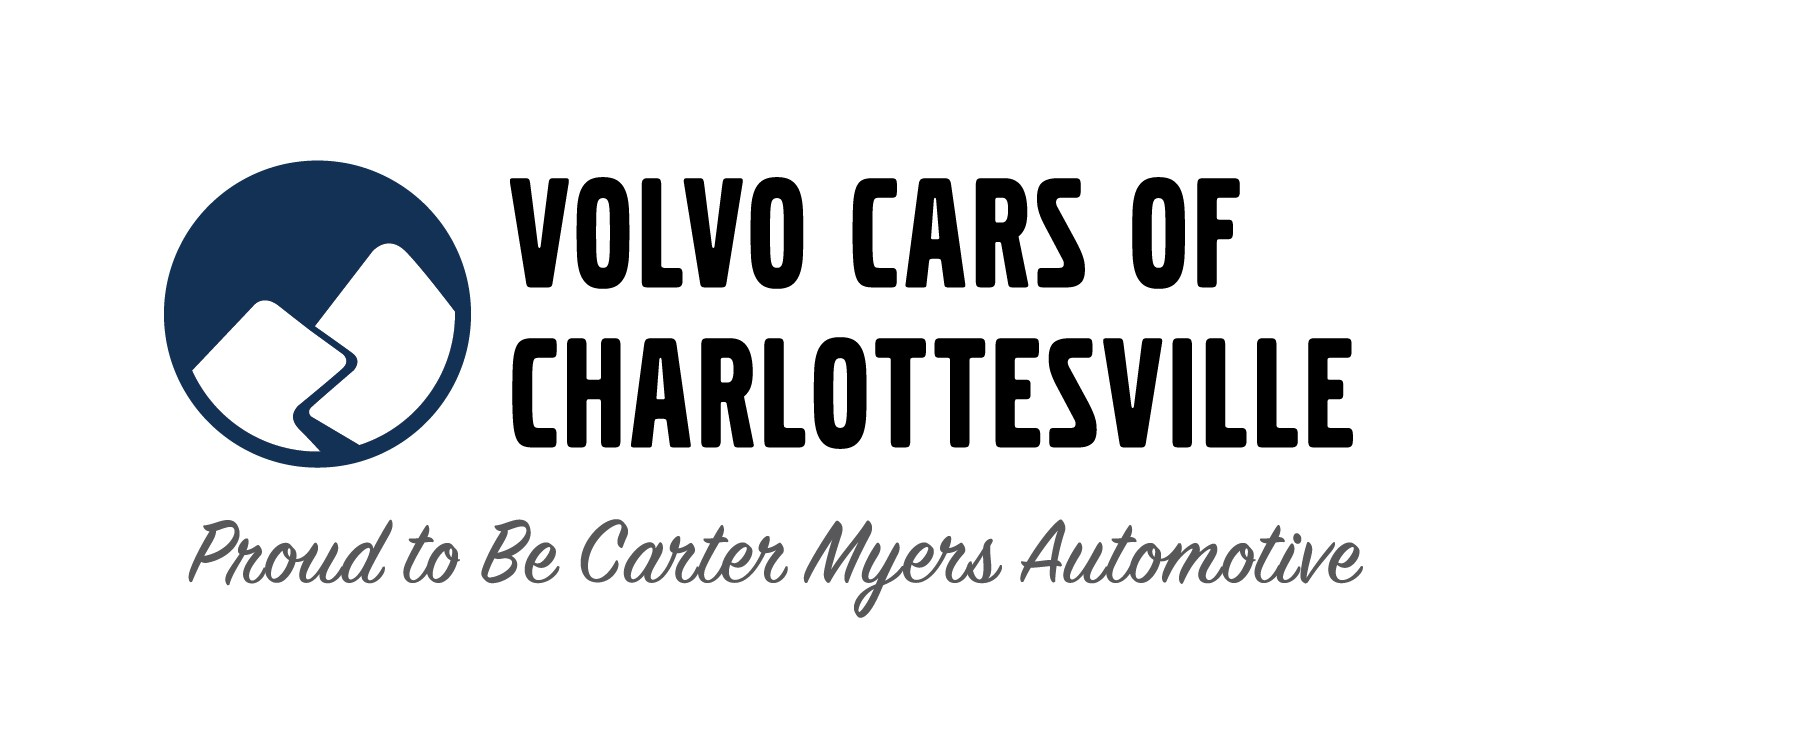 Volvo Of Charlottesville >> Volvo Cars Of Charlottesville Linkedin